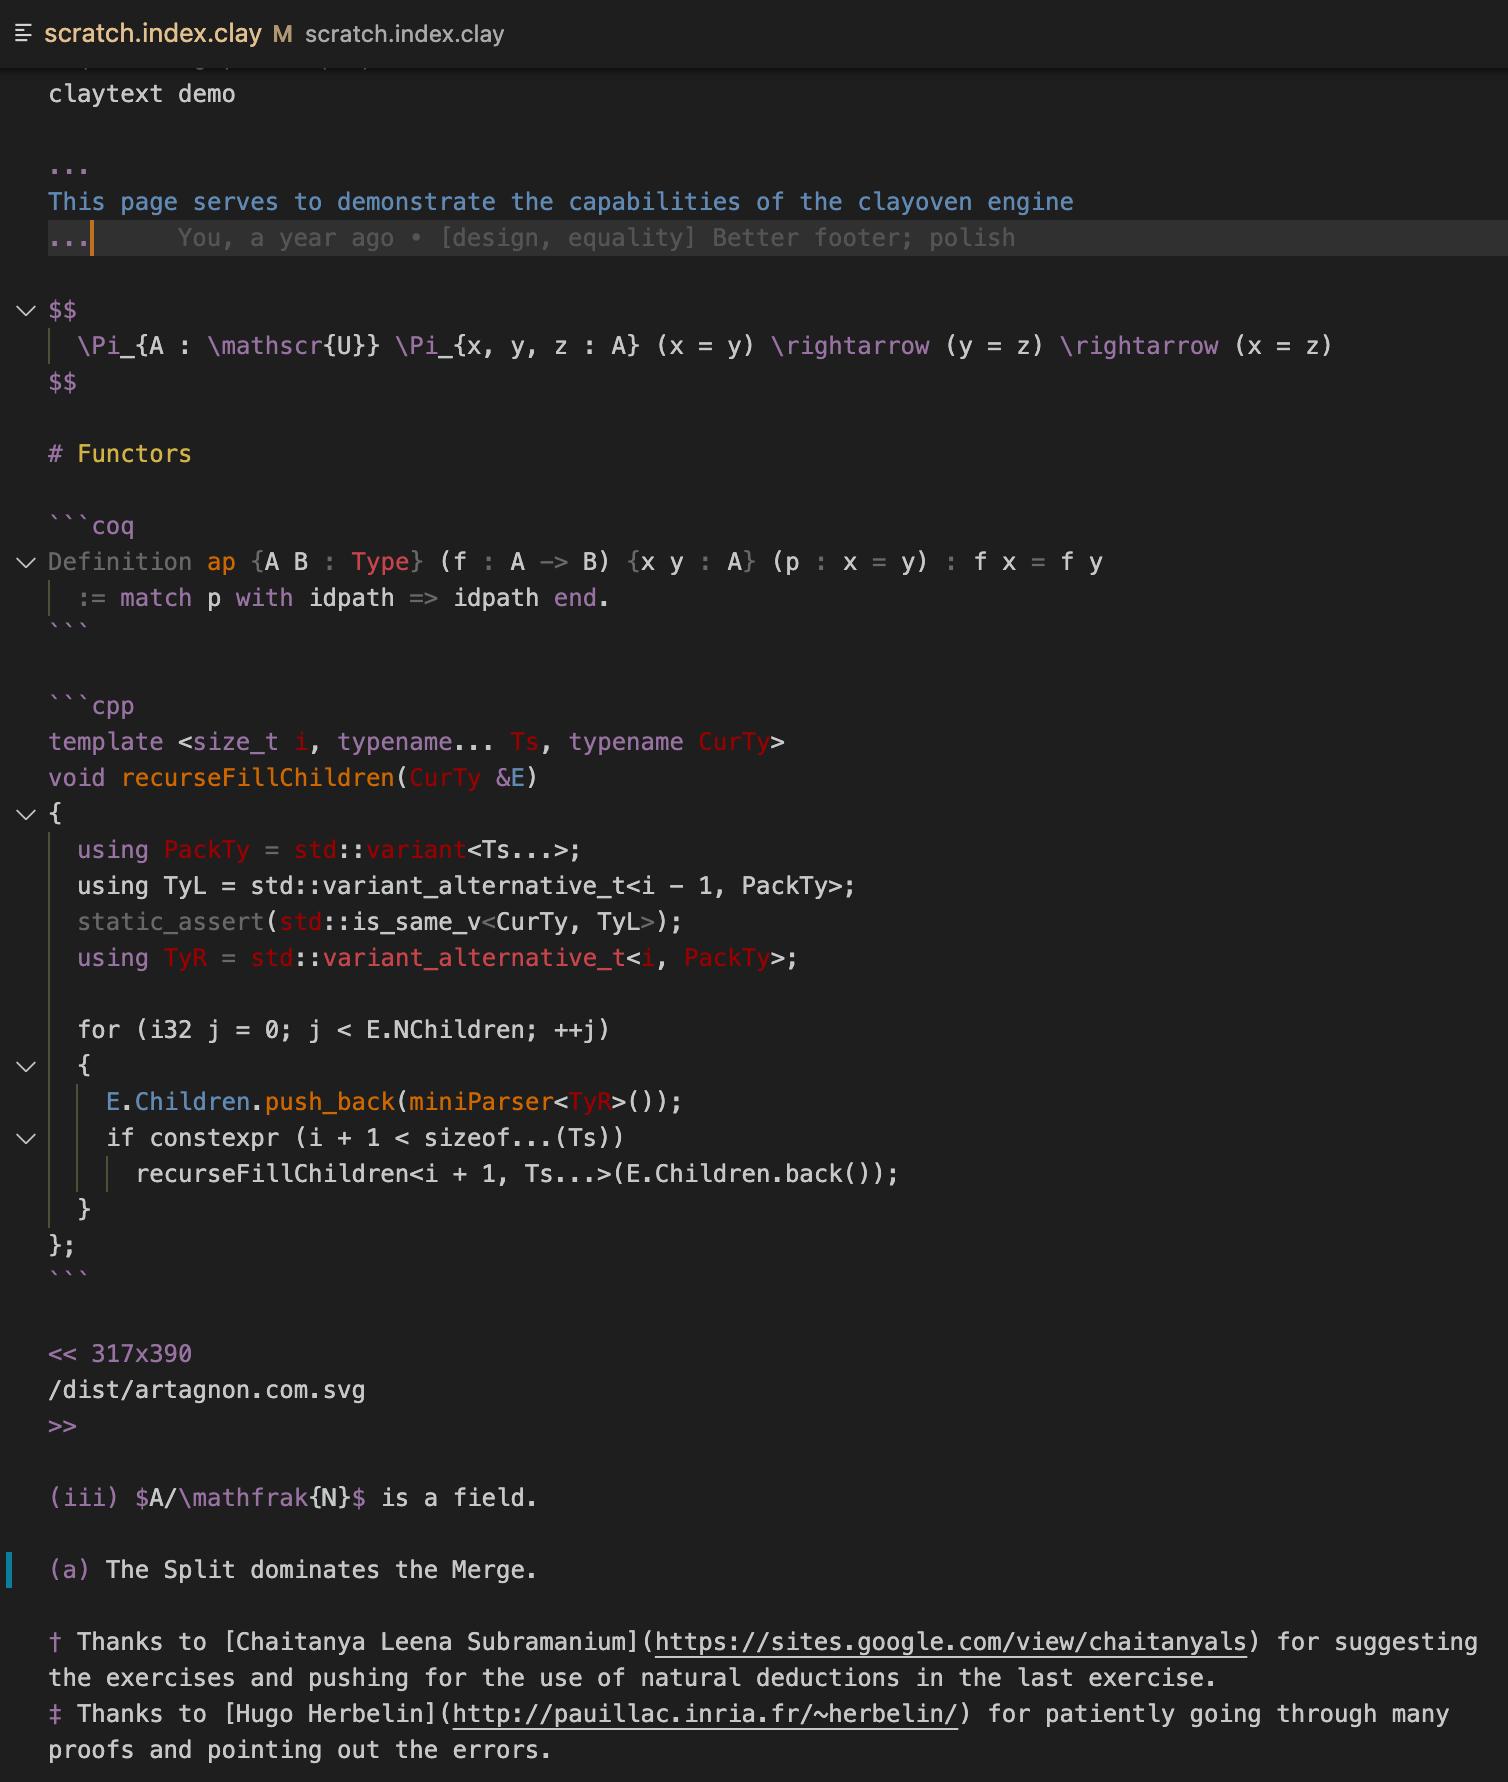 syntax highlighting demo